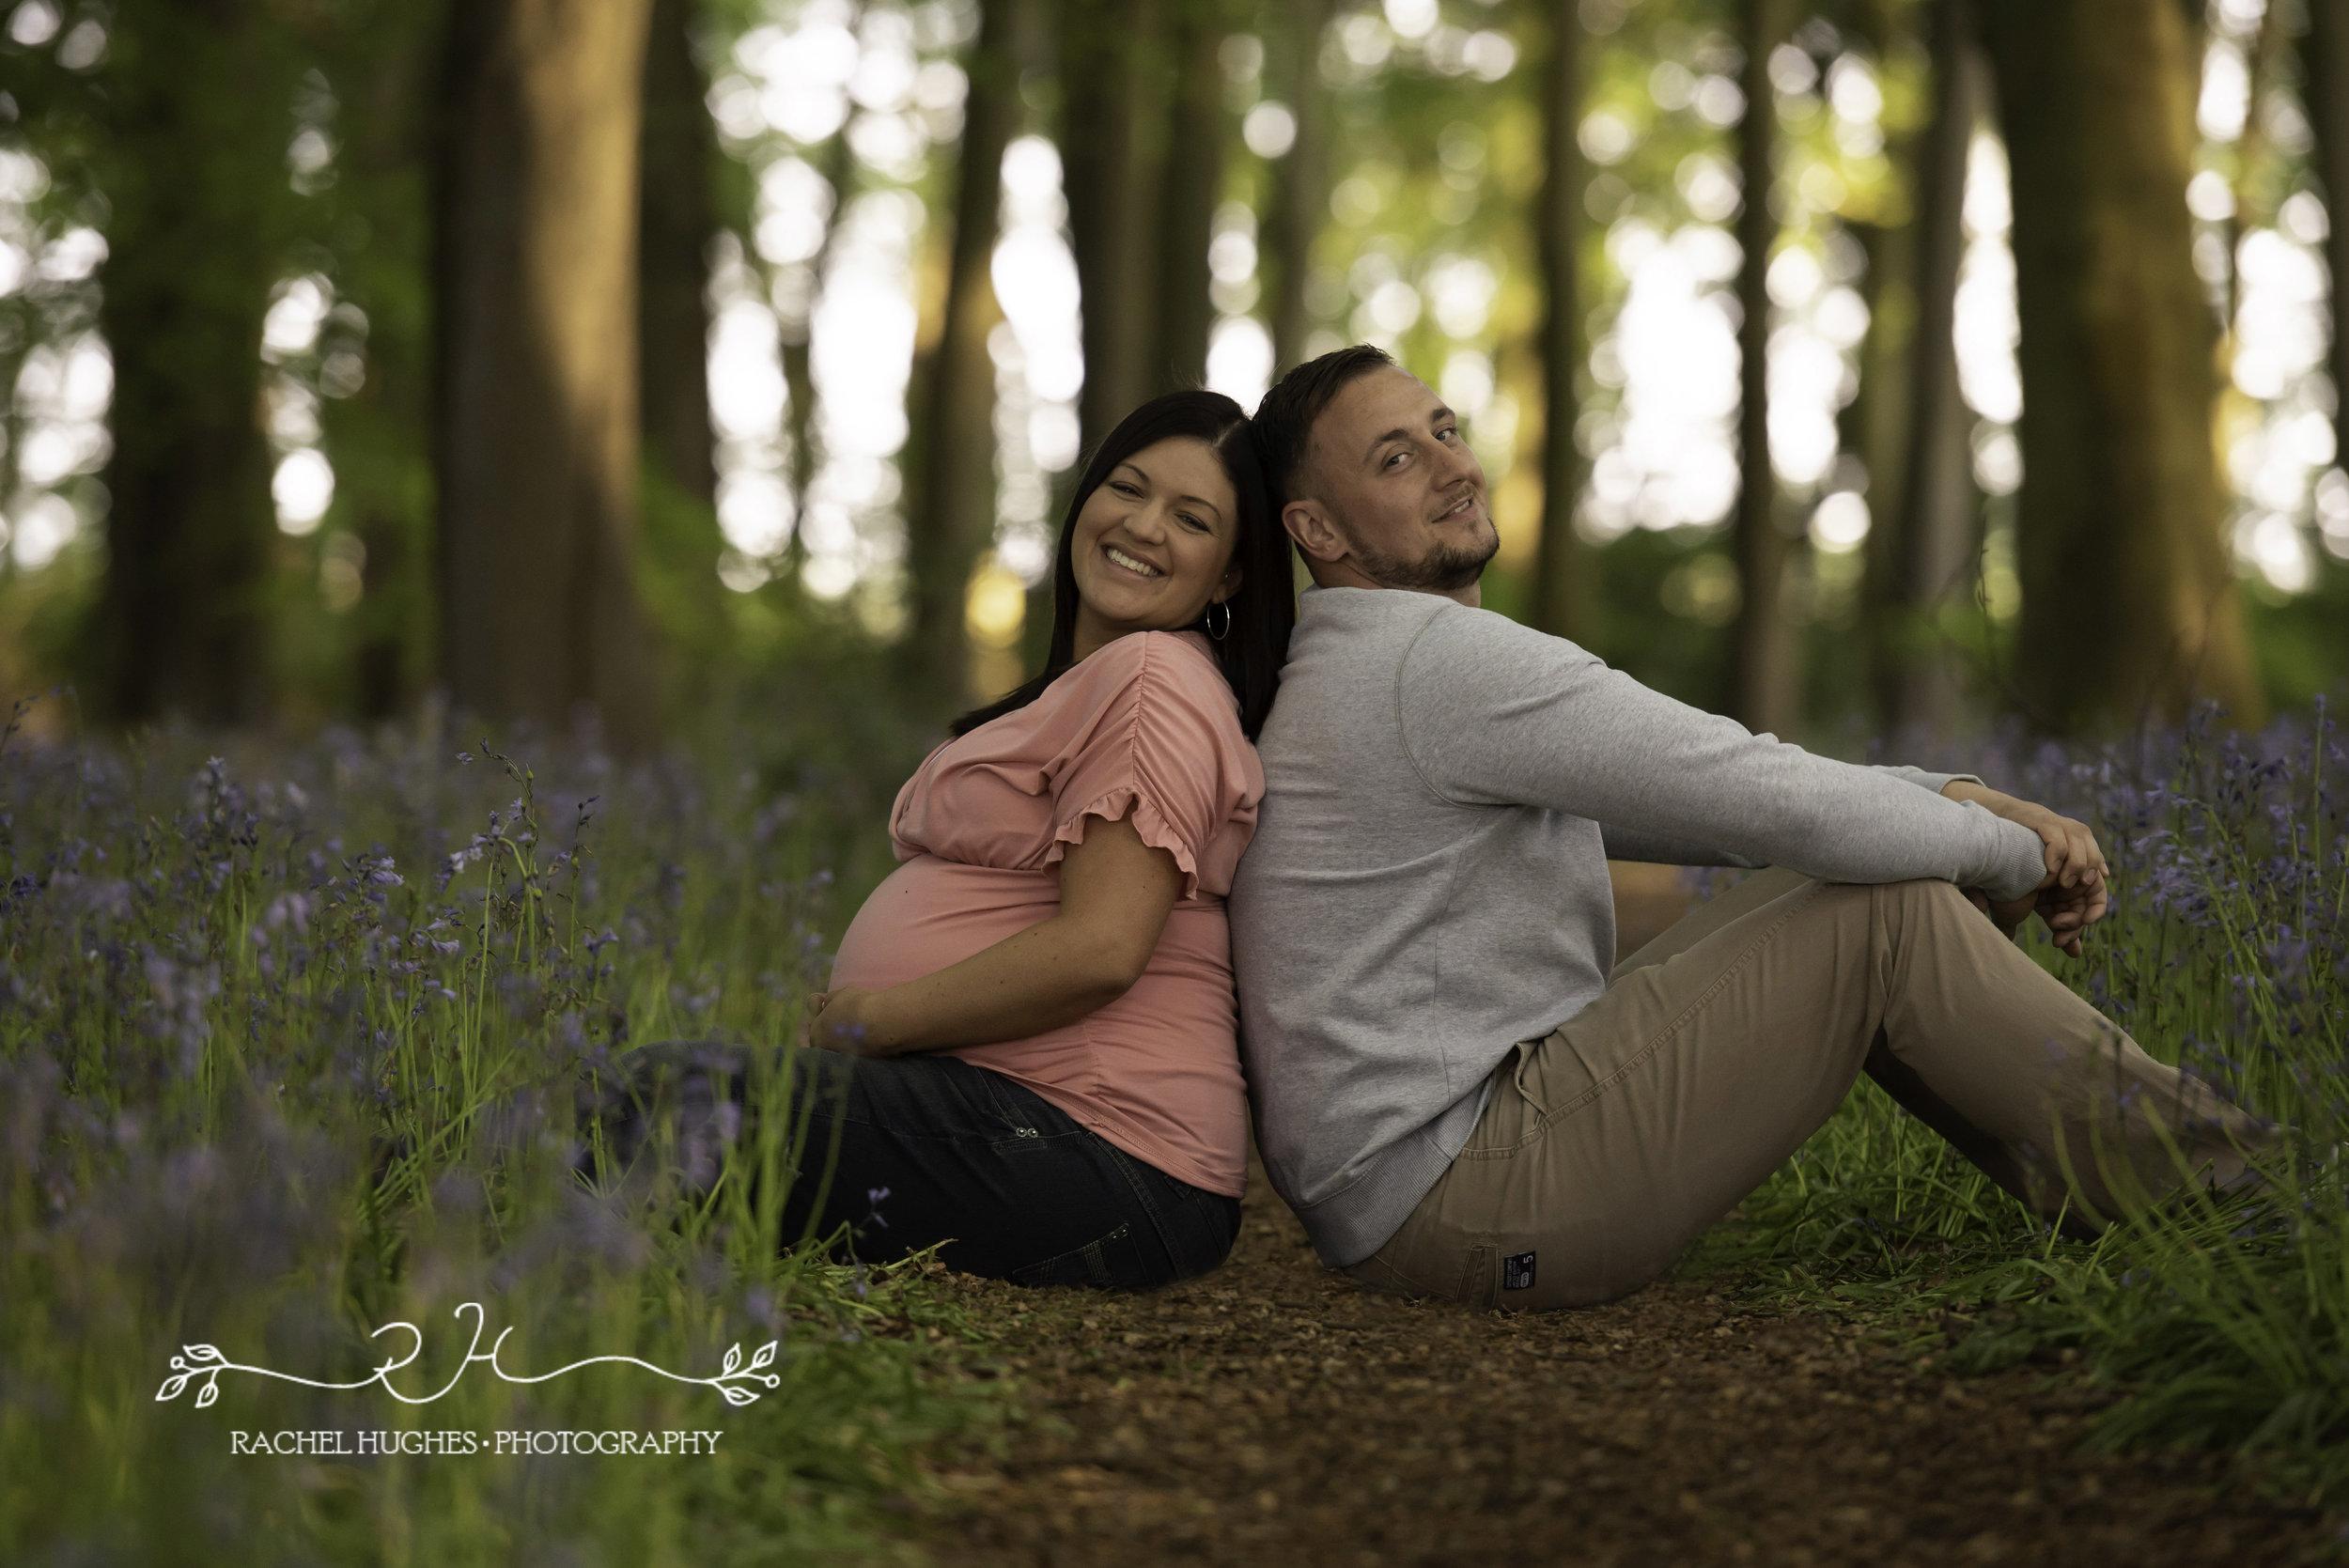 Maternity photoshoot Henley-on-Thames